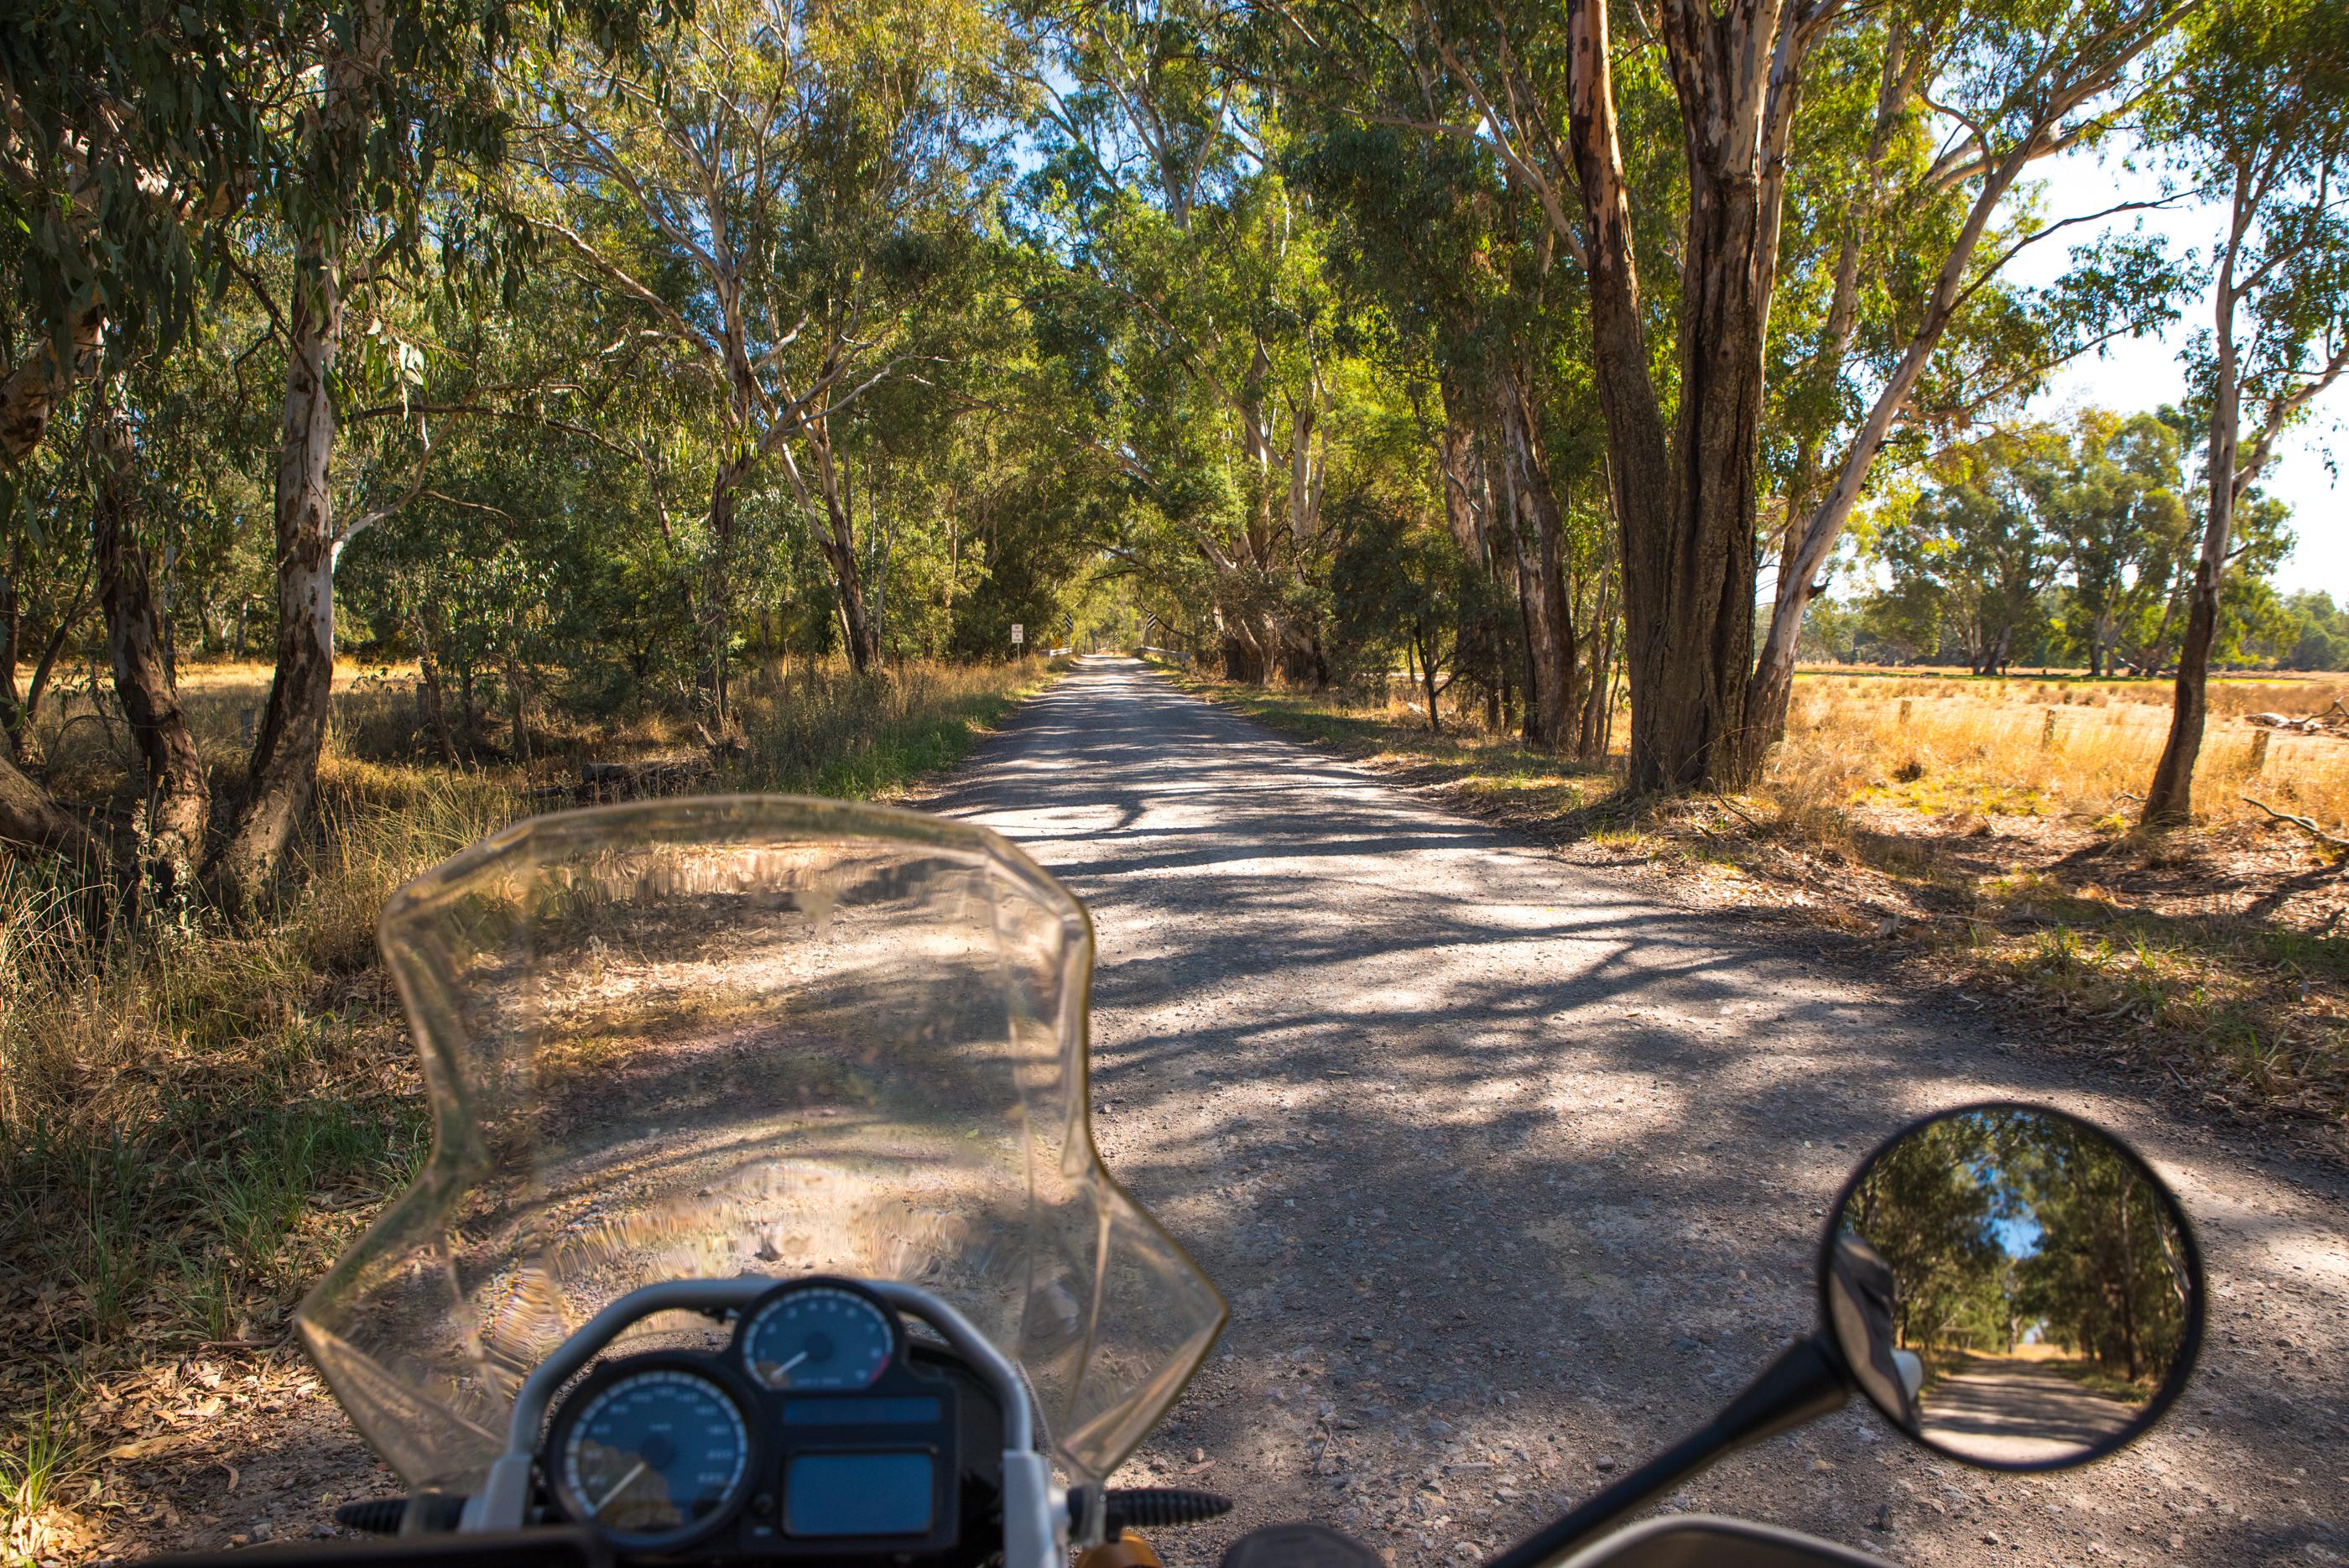 John Langmead_High Country Ride 3_3794_20180409_Online